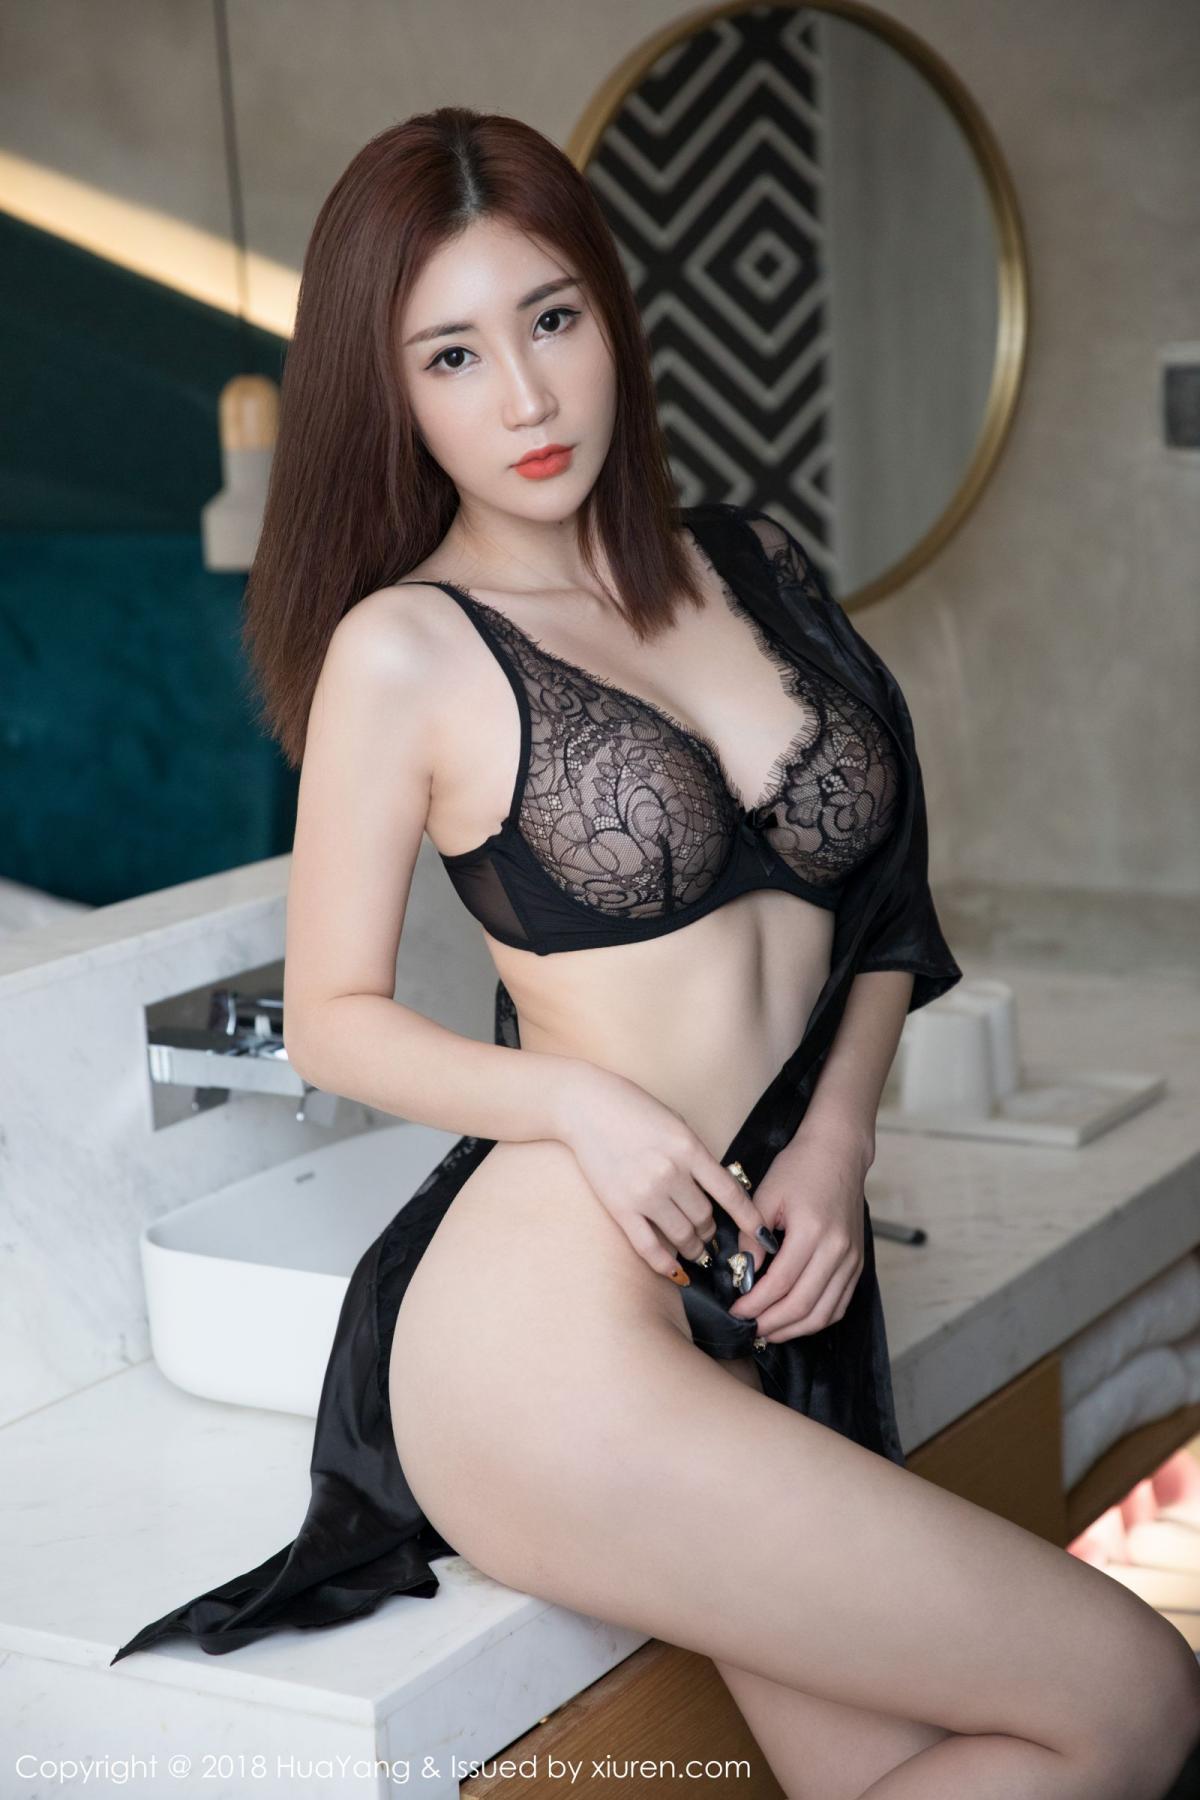 [Huayang] Vol.077 Sun Meng Yao 9P, Adult, Big Booty, HuaYang, Sun Meng Yao, Underwear